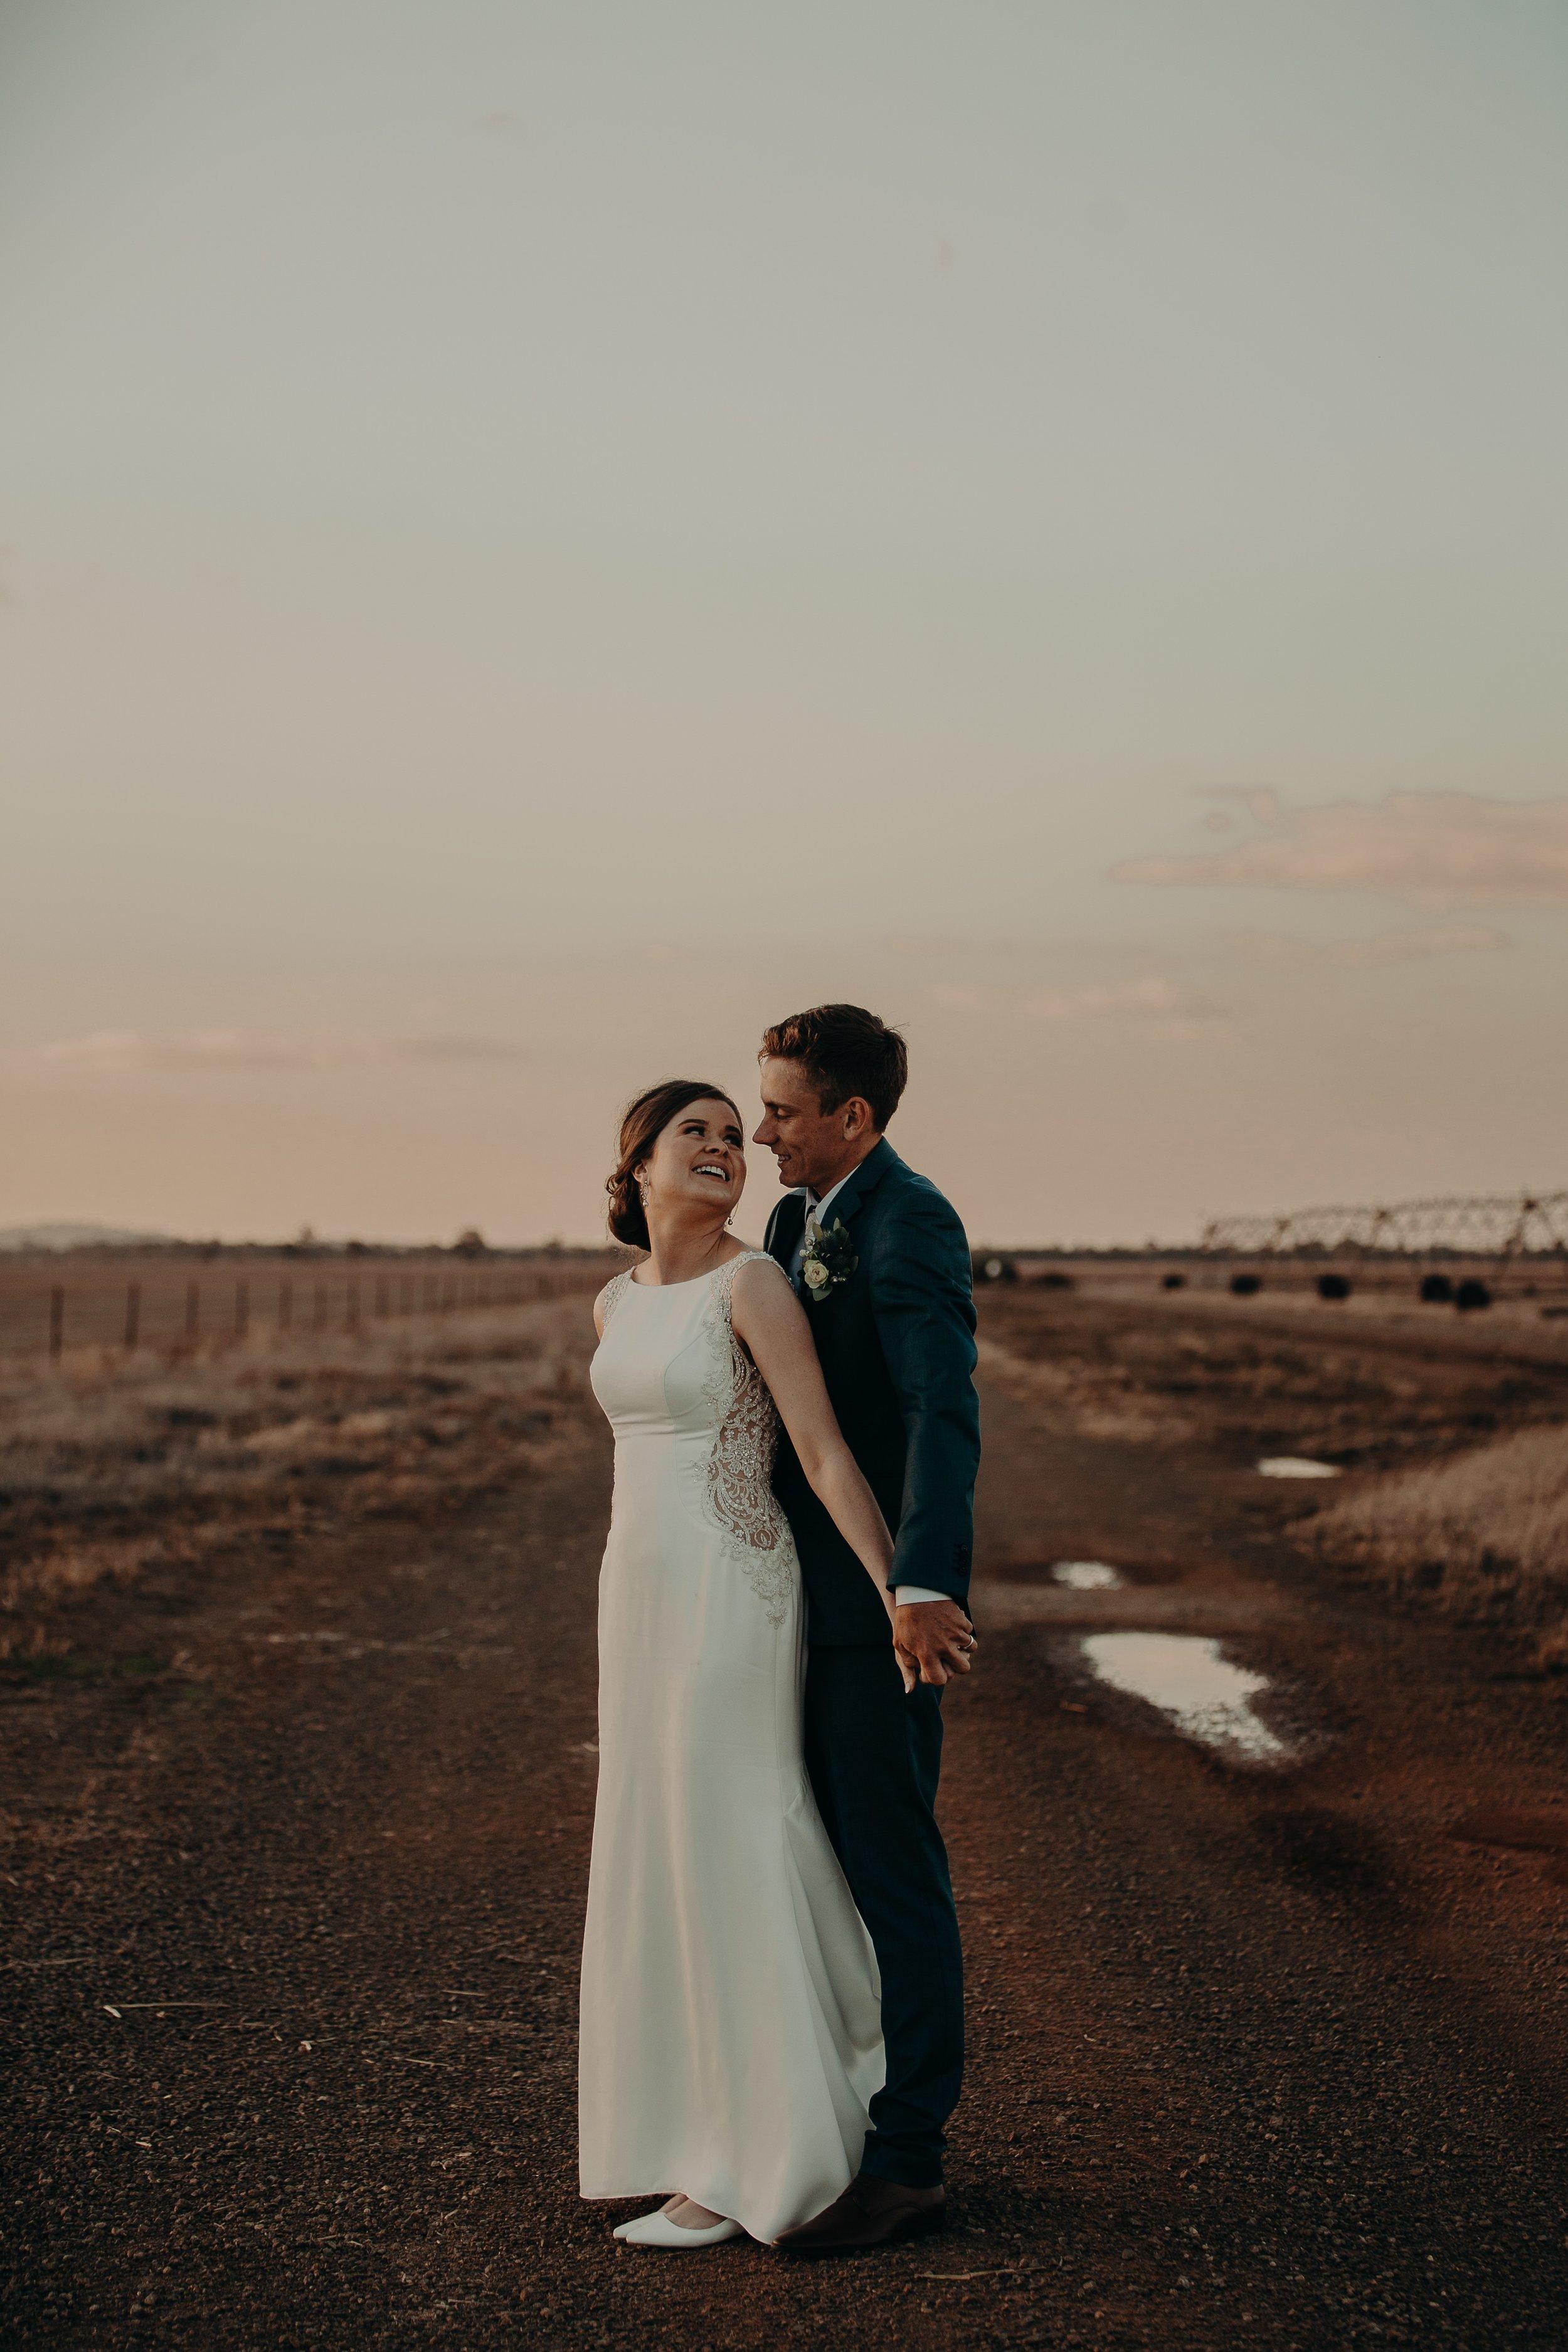 mickalathomas_puremacphotography_weddingphotographer_couplephotographer_Sheppartonphotographer_2566.jpg